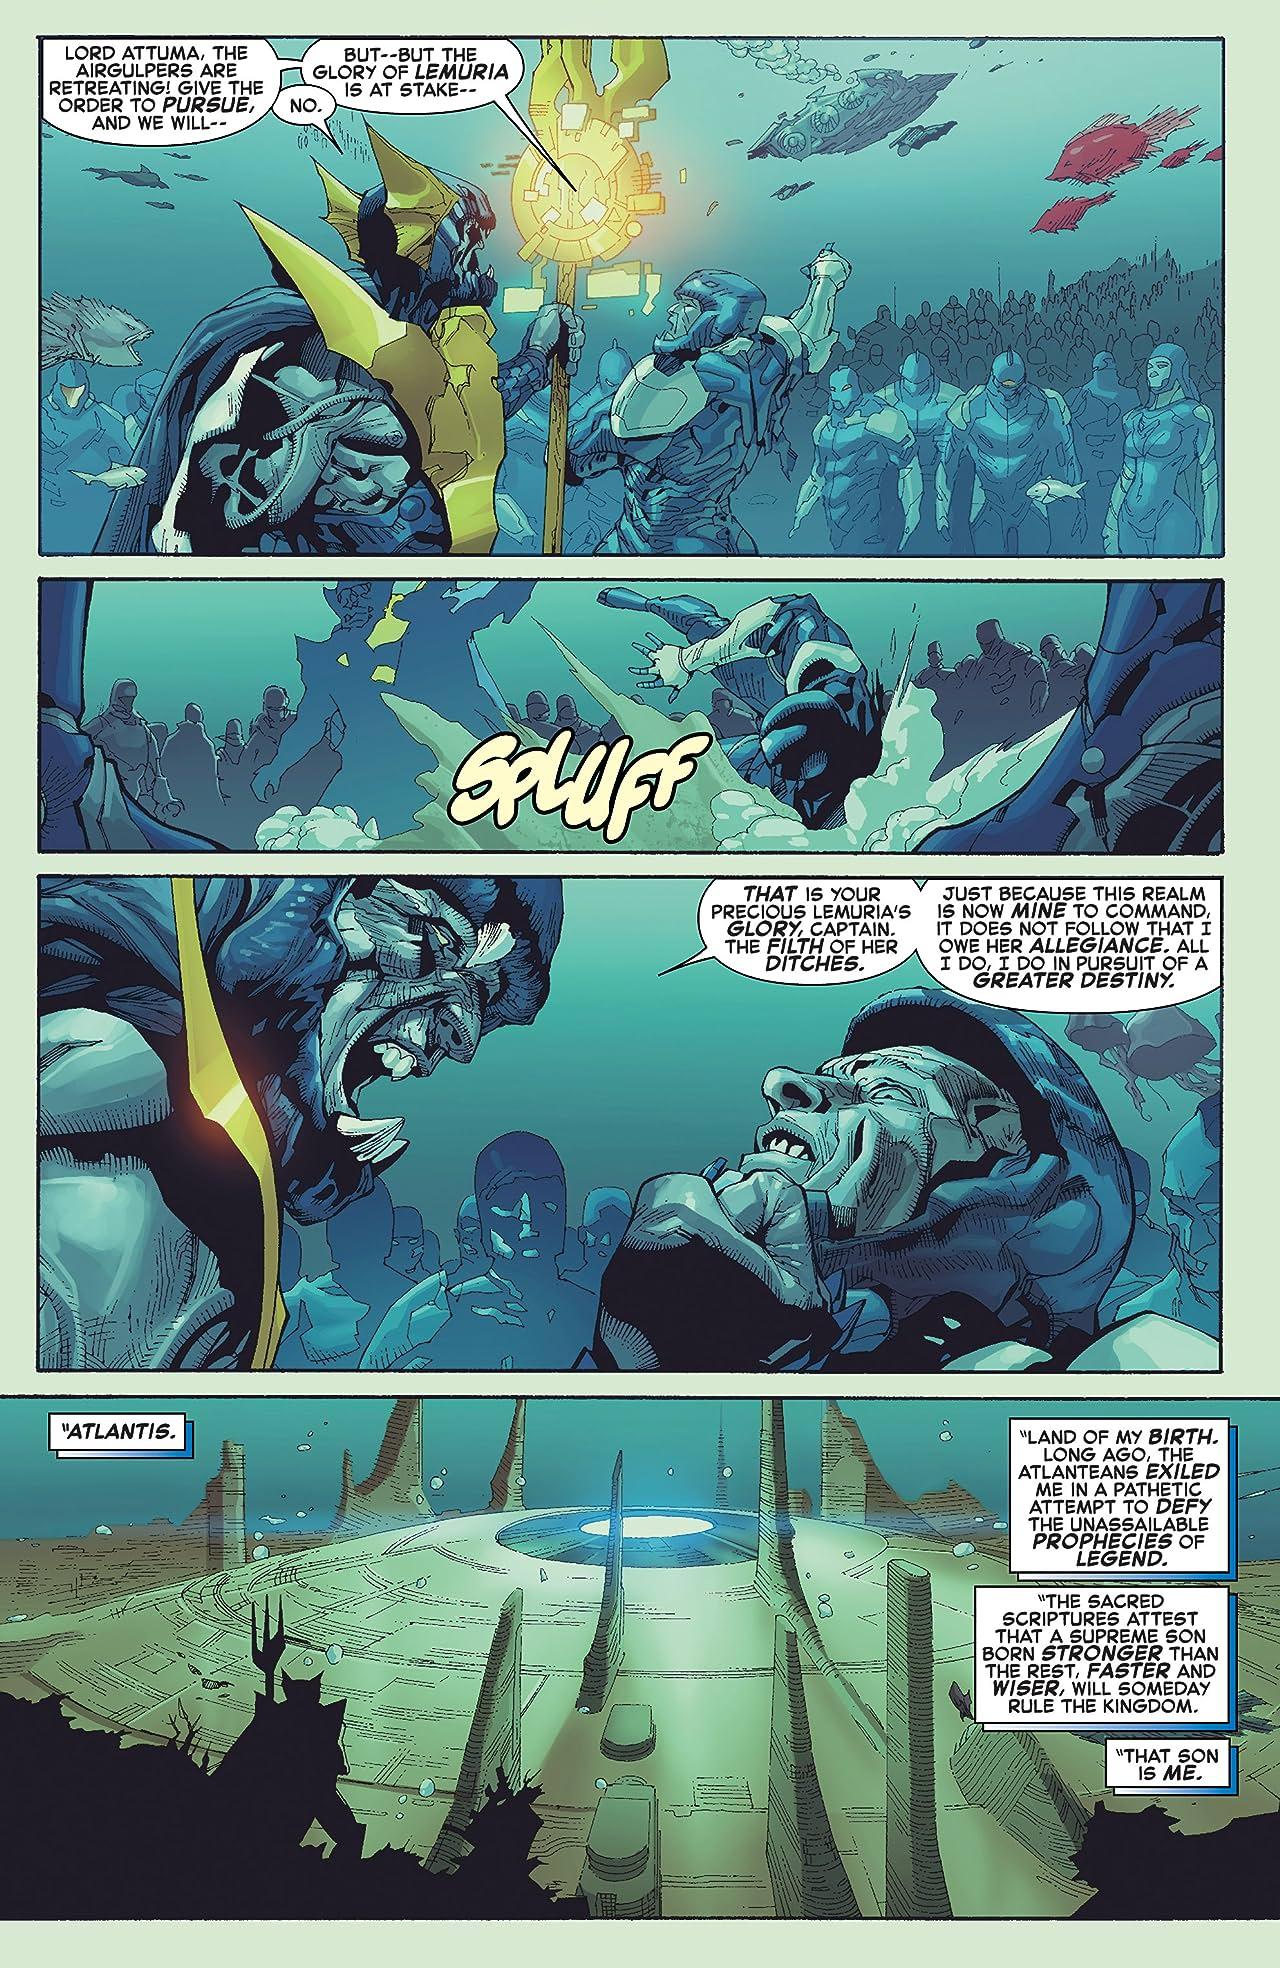 Indestructible Hulk #5